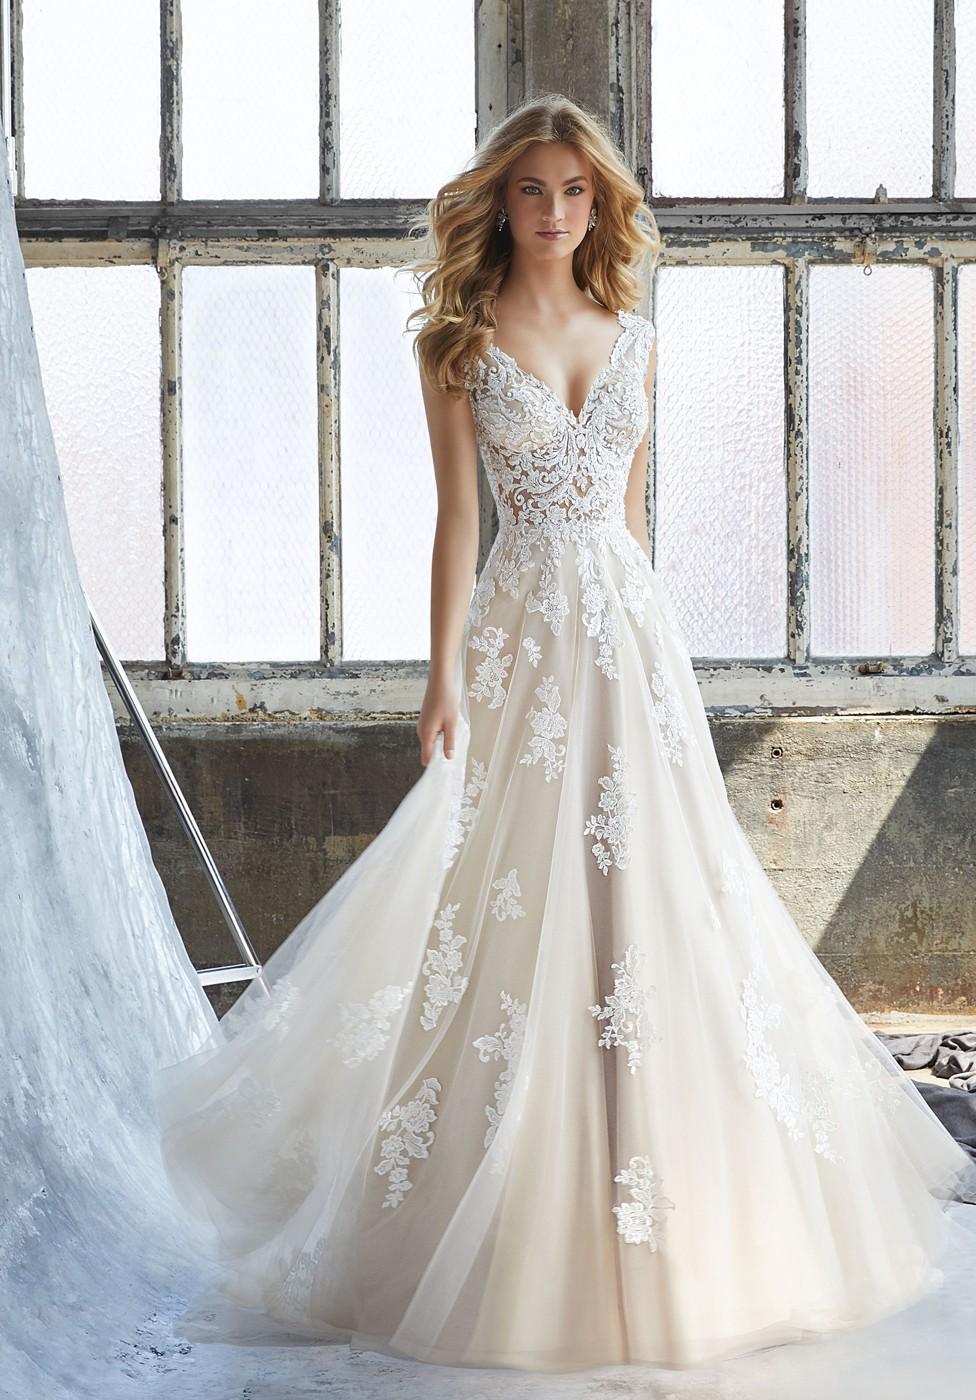 mori lee wedding dresses mori lee - dress style 8206 kennedy ... wqoioly